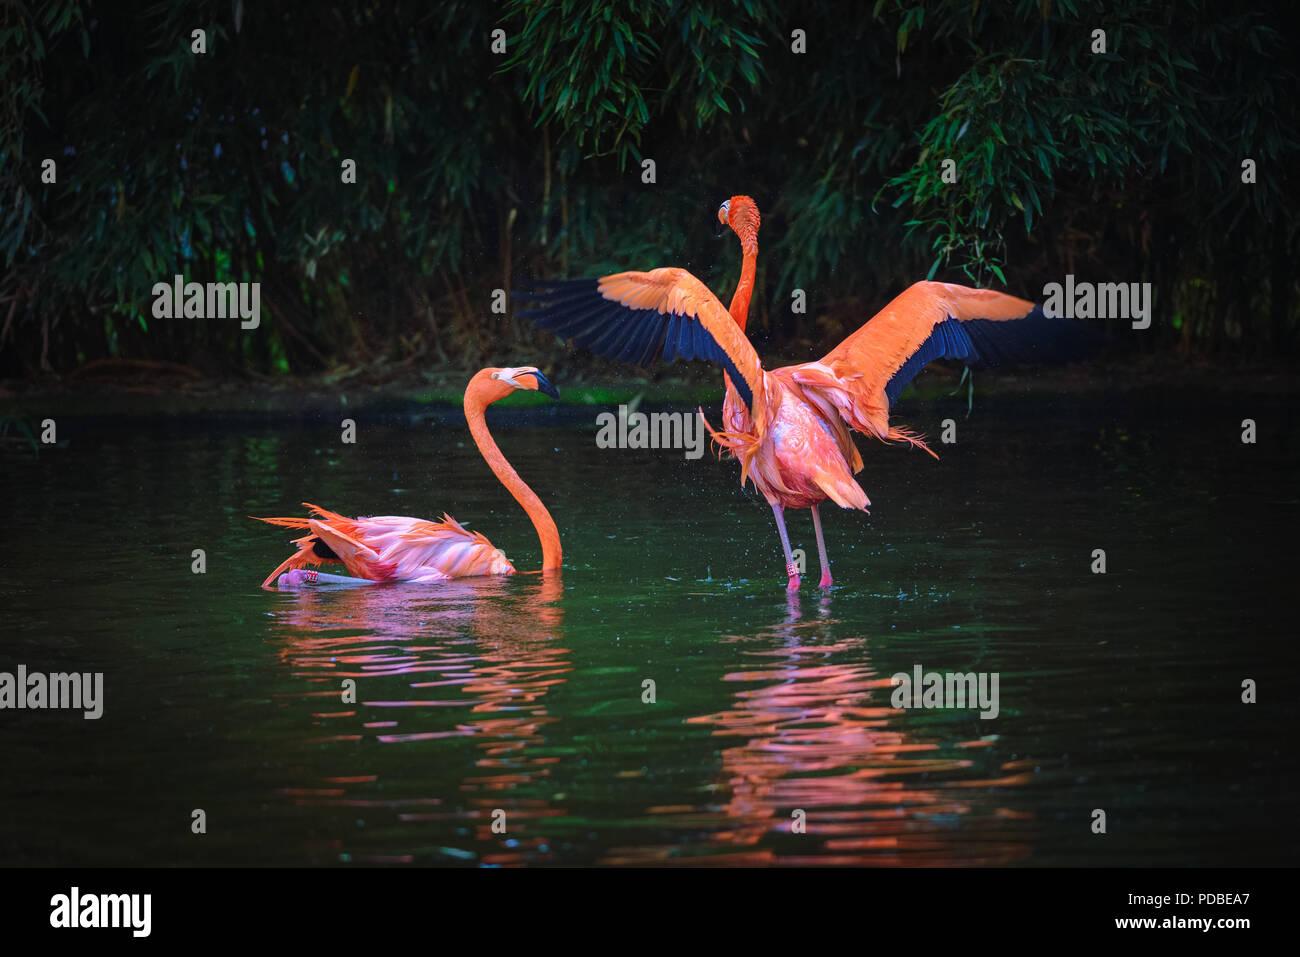 Two Caribbean Flamingos in a lake Stock Photo